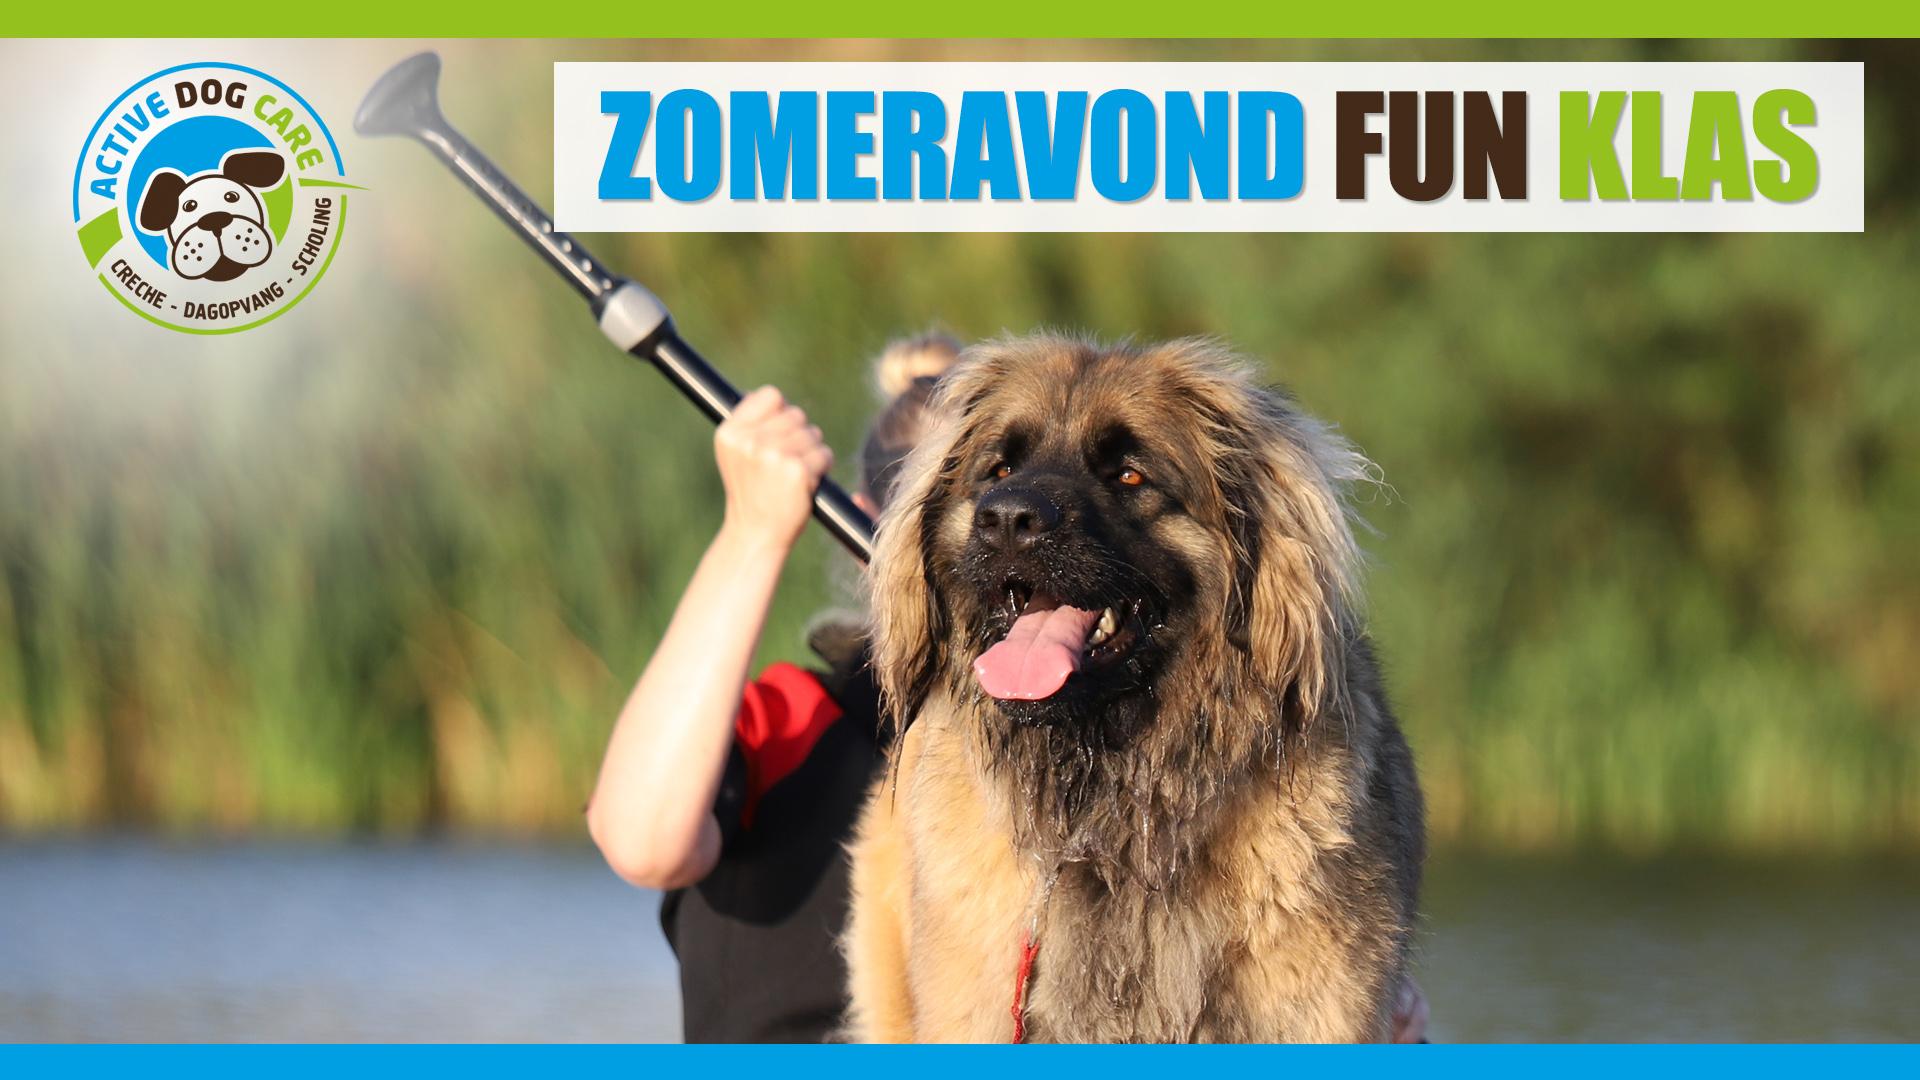 Zomeravond Fun Klas - Active Dog Care